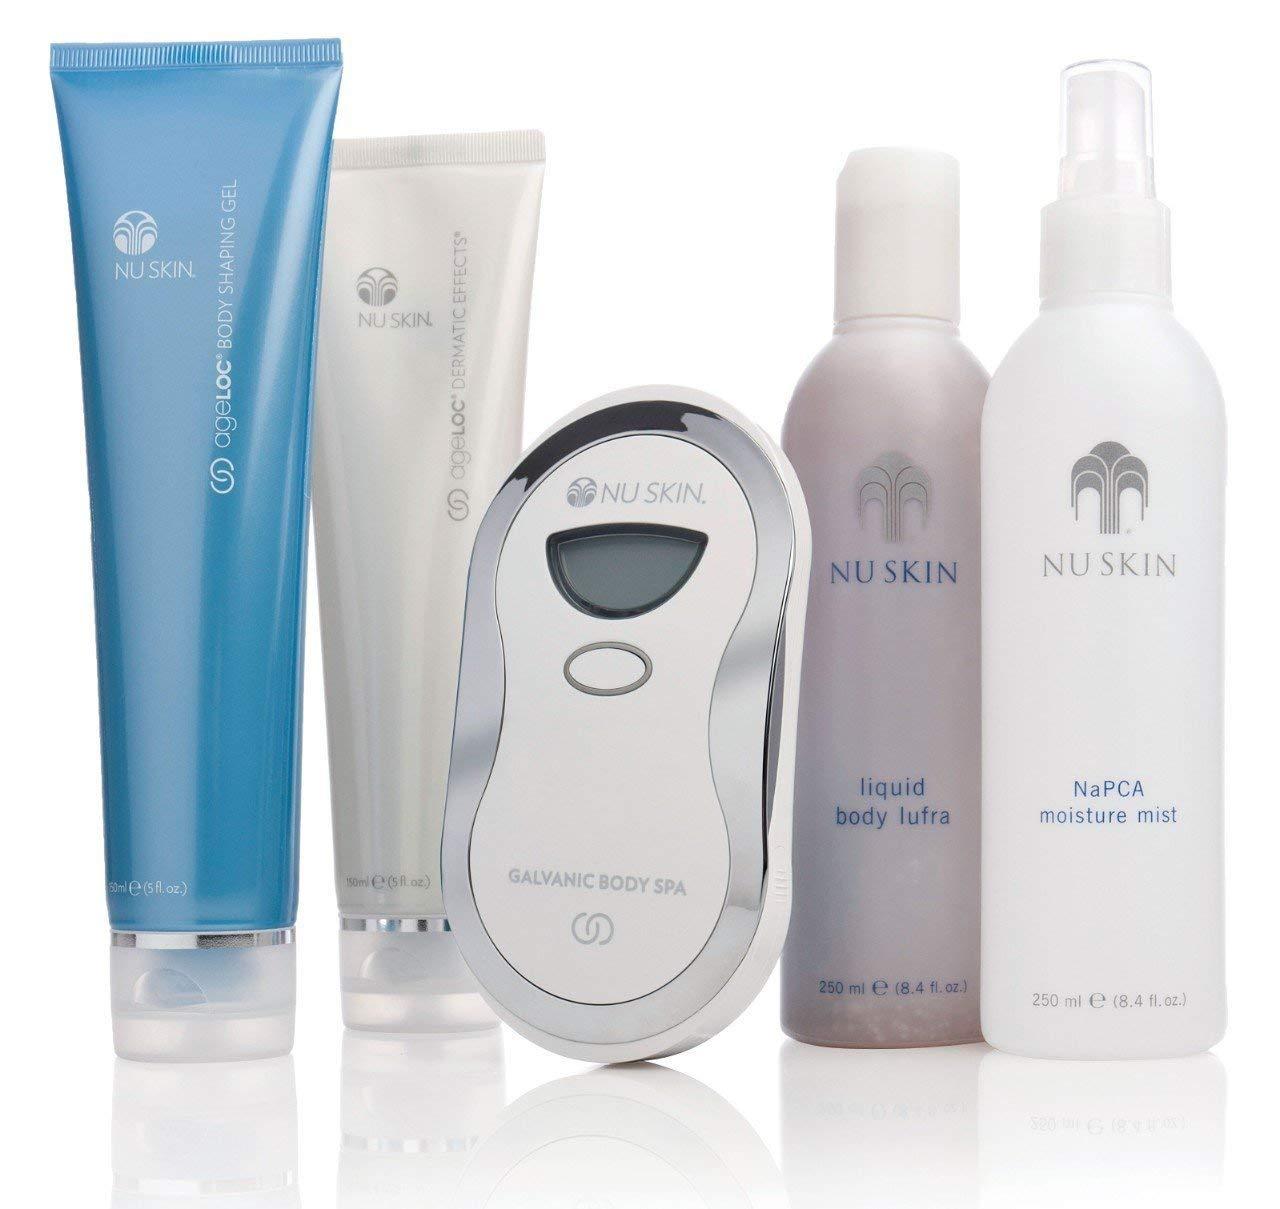 Ageloc Com buy nu skin nuskin ageloc galvanic redesign body spa system